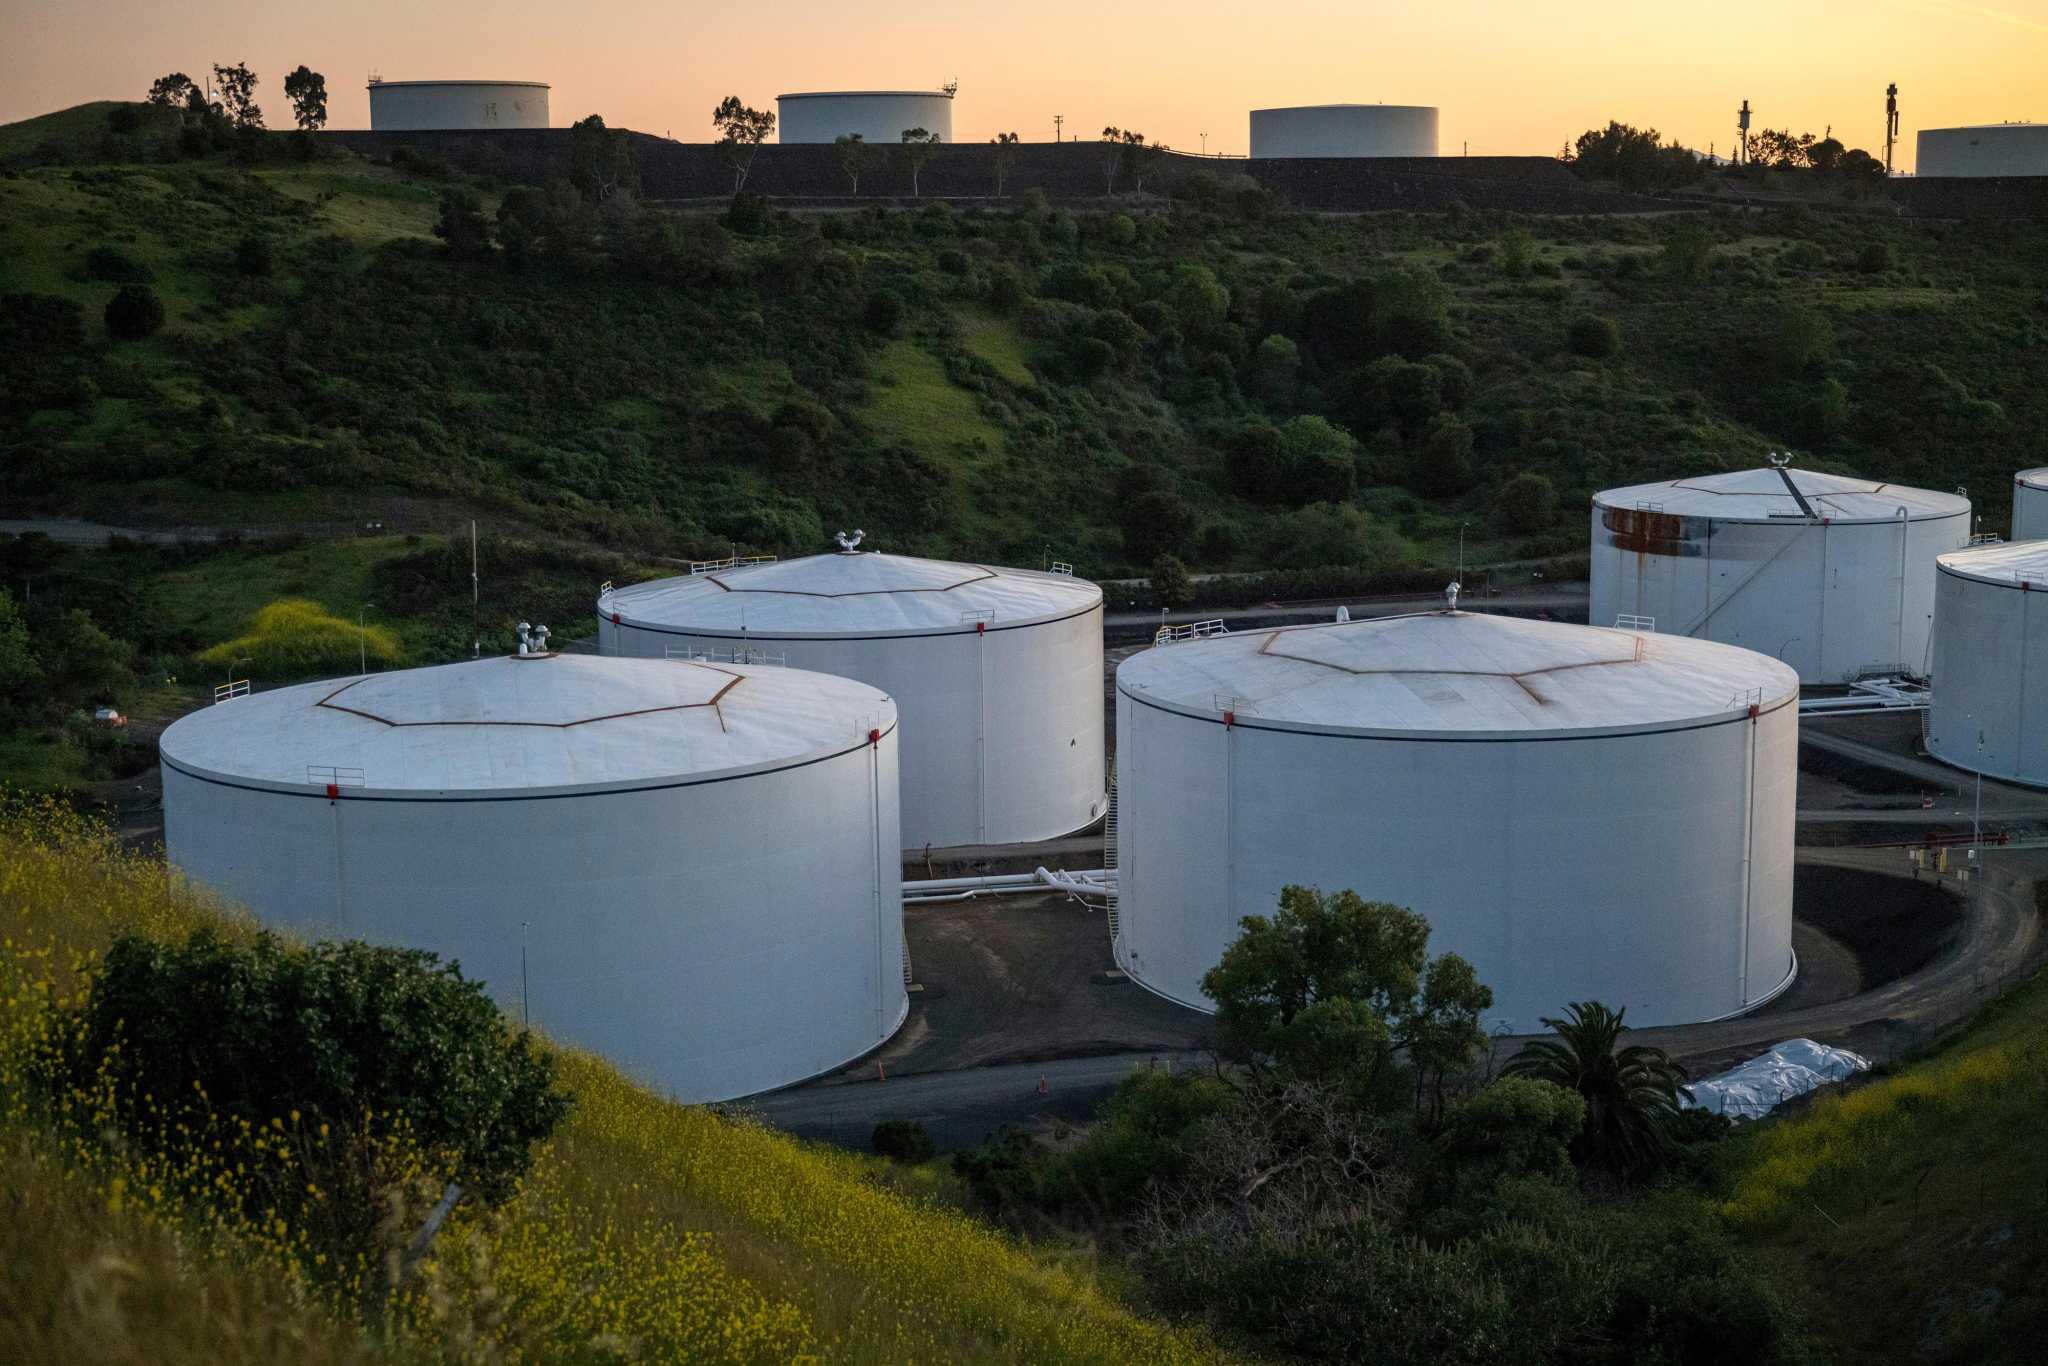 Oil rises with shrinking U.S. stockpiles signaling demand pickup